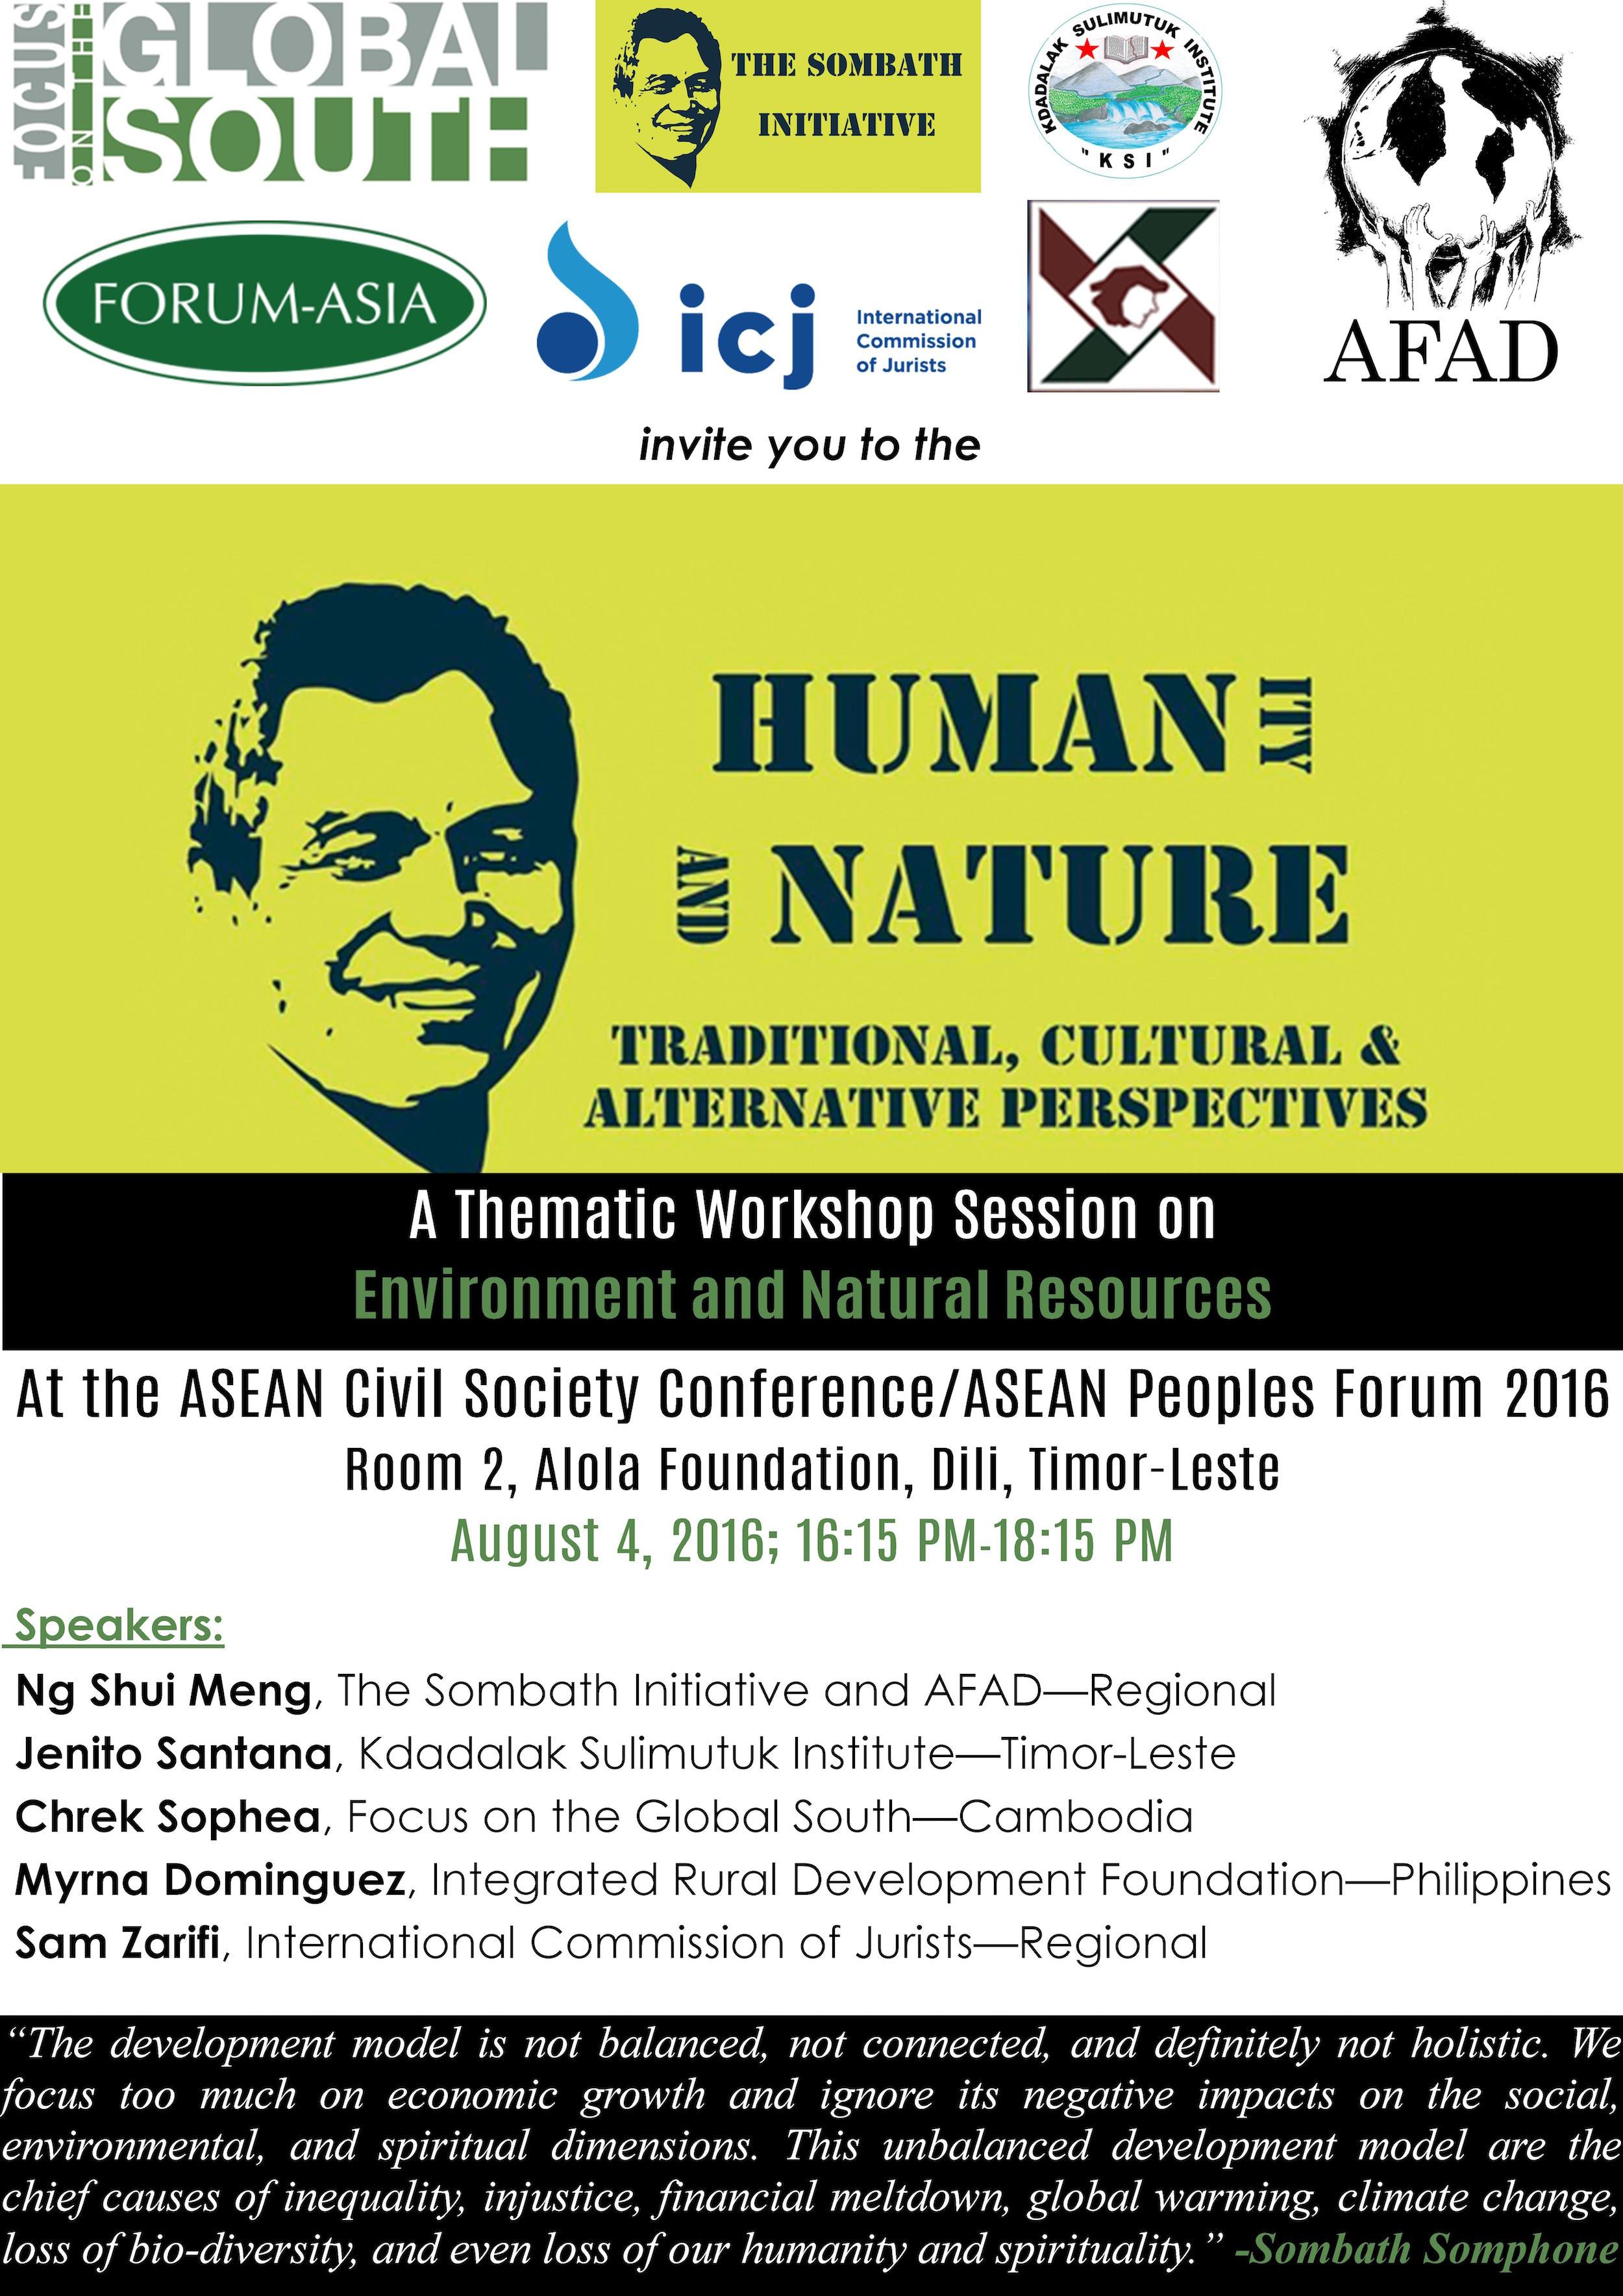 Workshop on Sombath at ACSC/APF